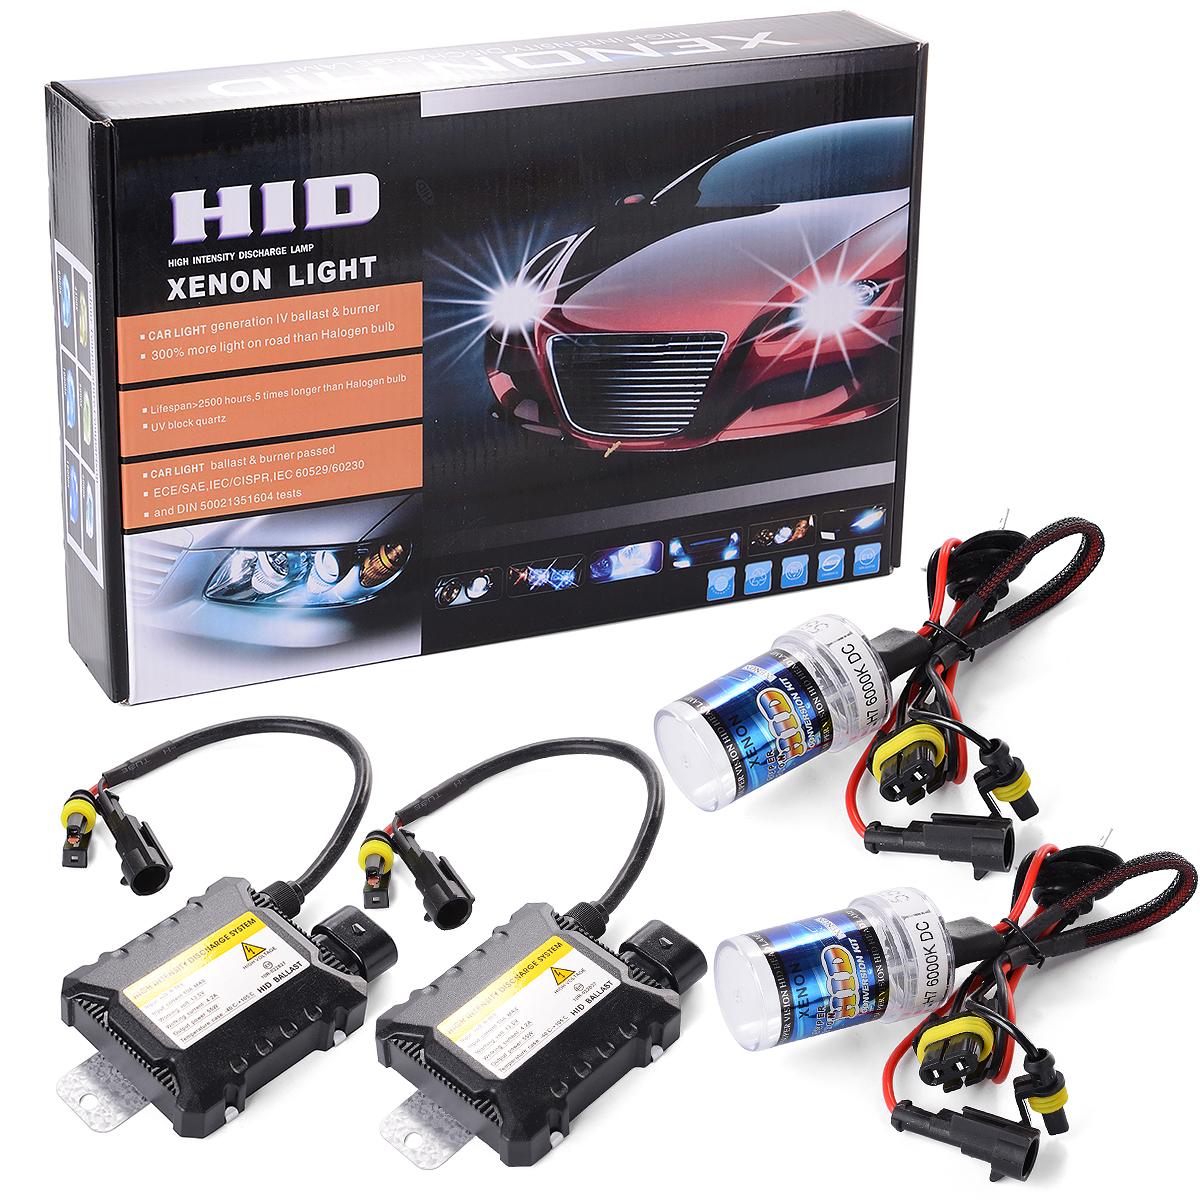 ... XCSOURCE 55W HID Xenon Light Headlight Lamp Conversion Kit H7 6000K Replacement Bulb MA98 ...